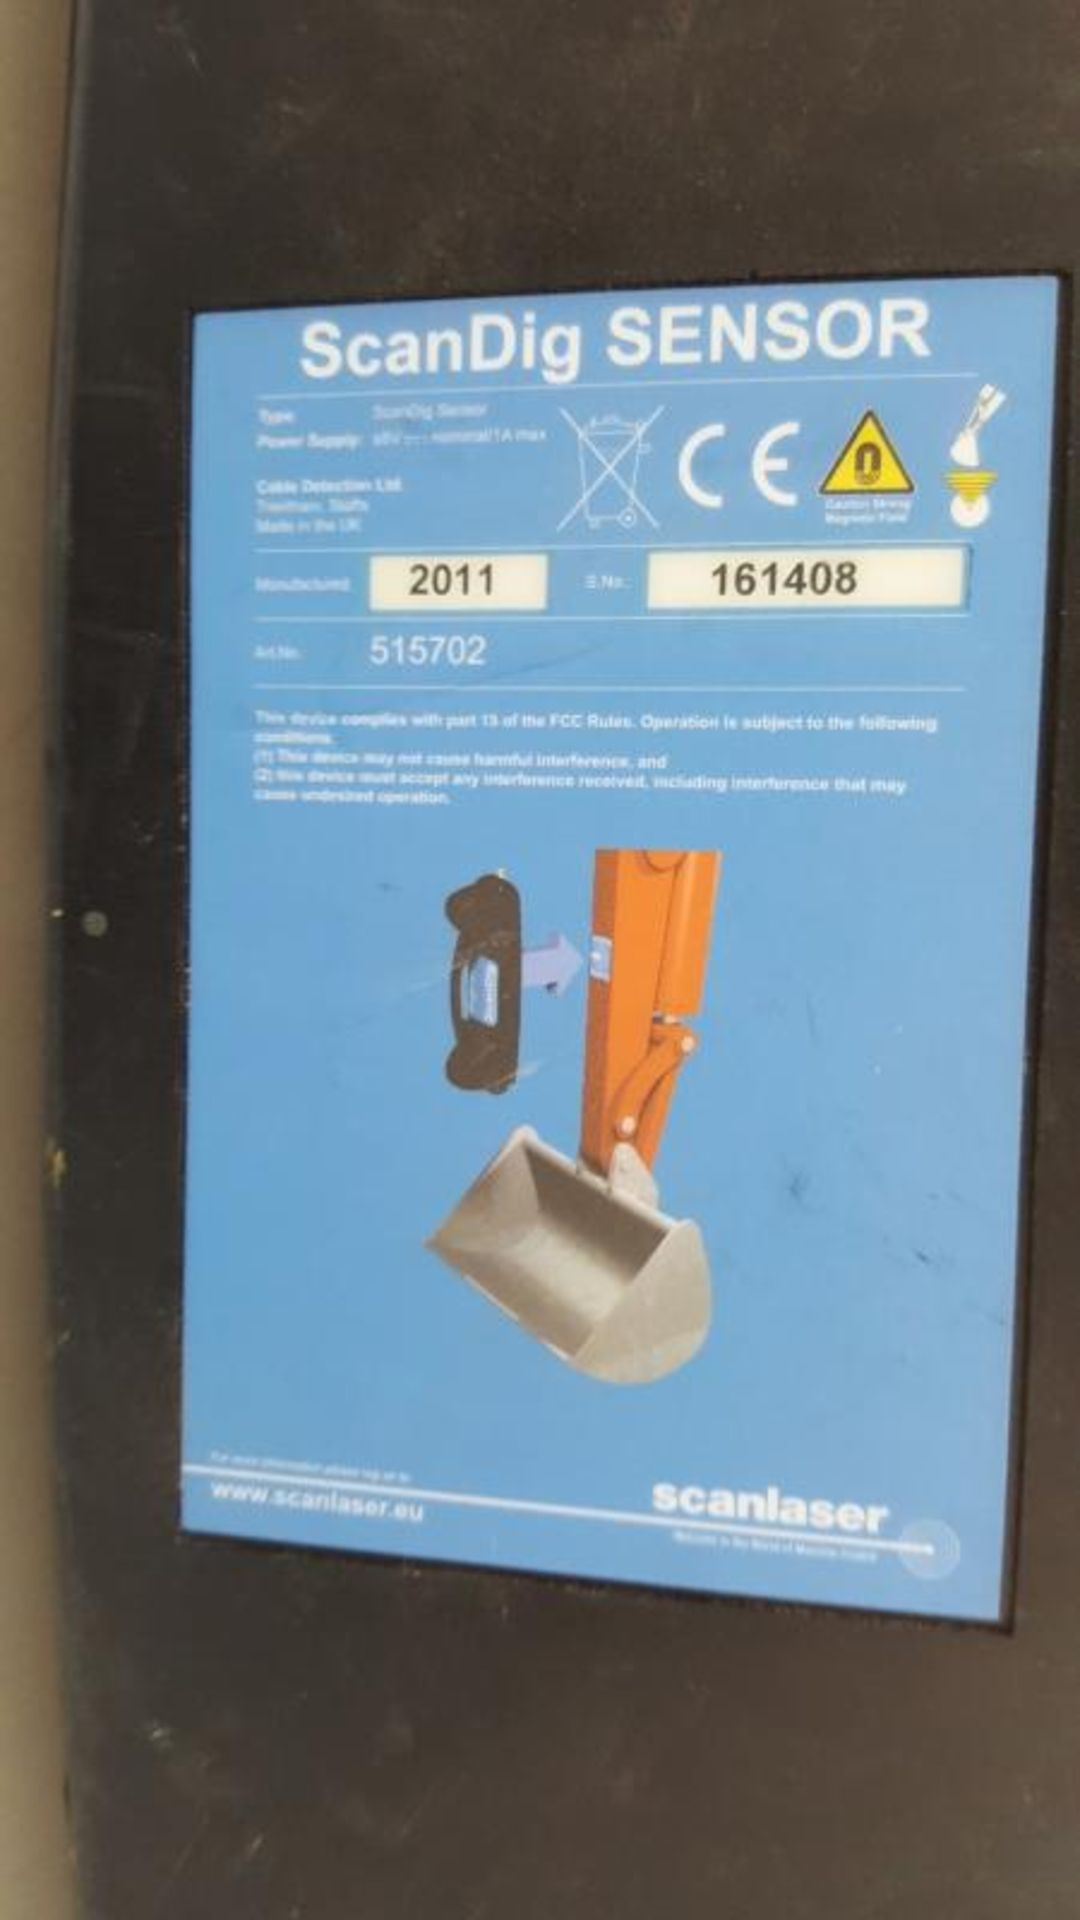 Lot 6422 - 1 x ScanDig Excavator Mounted Cable Location System With Excavator Sensor, ScanDig Digital Control